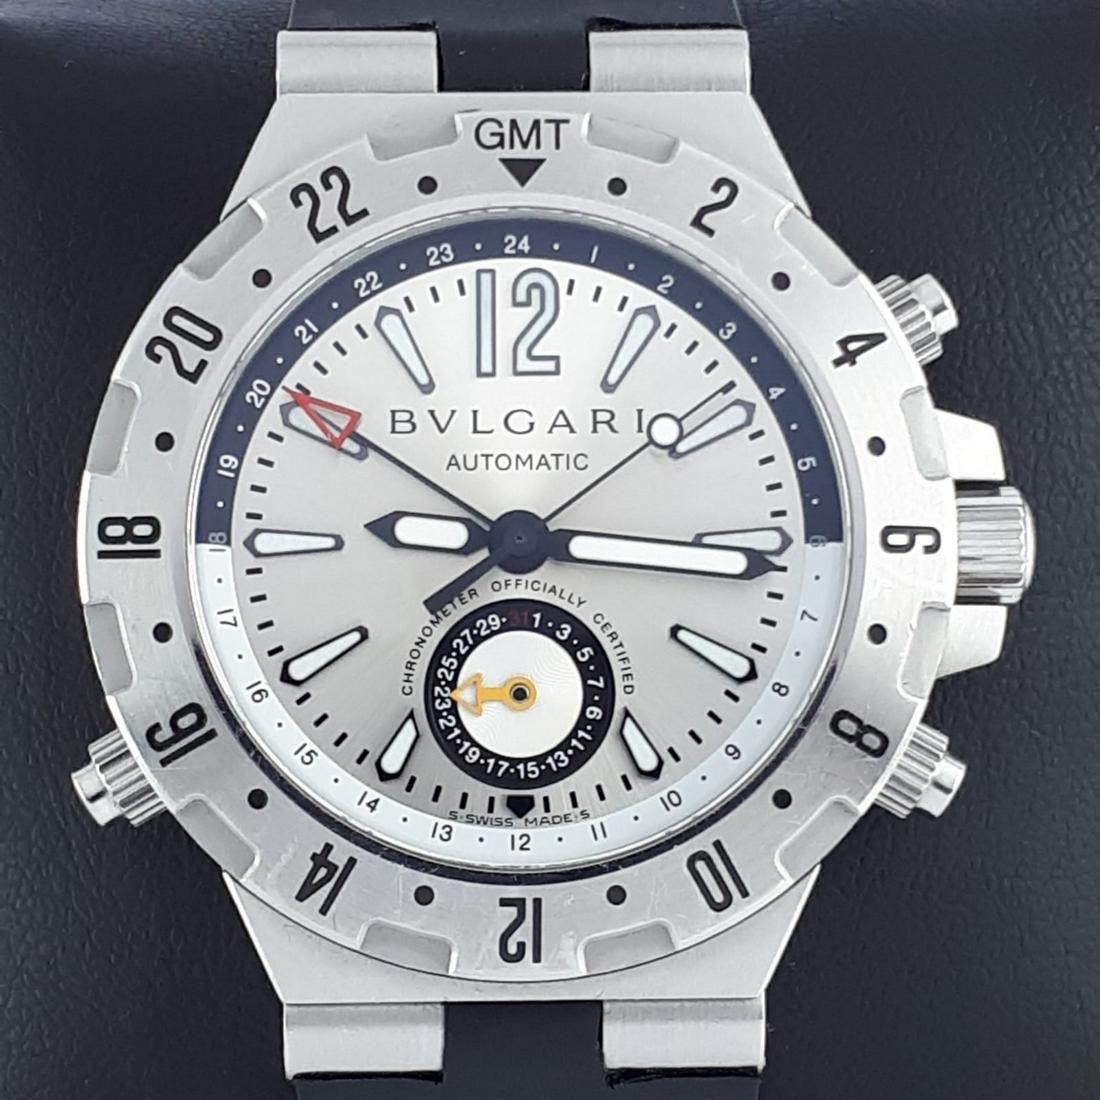 Bulgari - Diagono Professional GMT Automatic - Ref: GMT